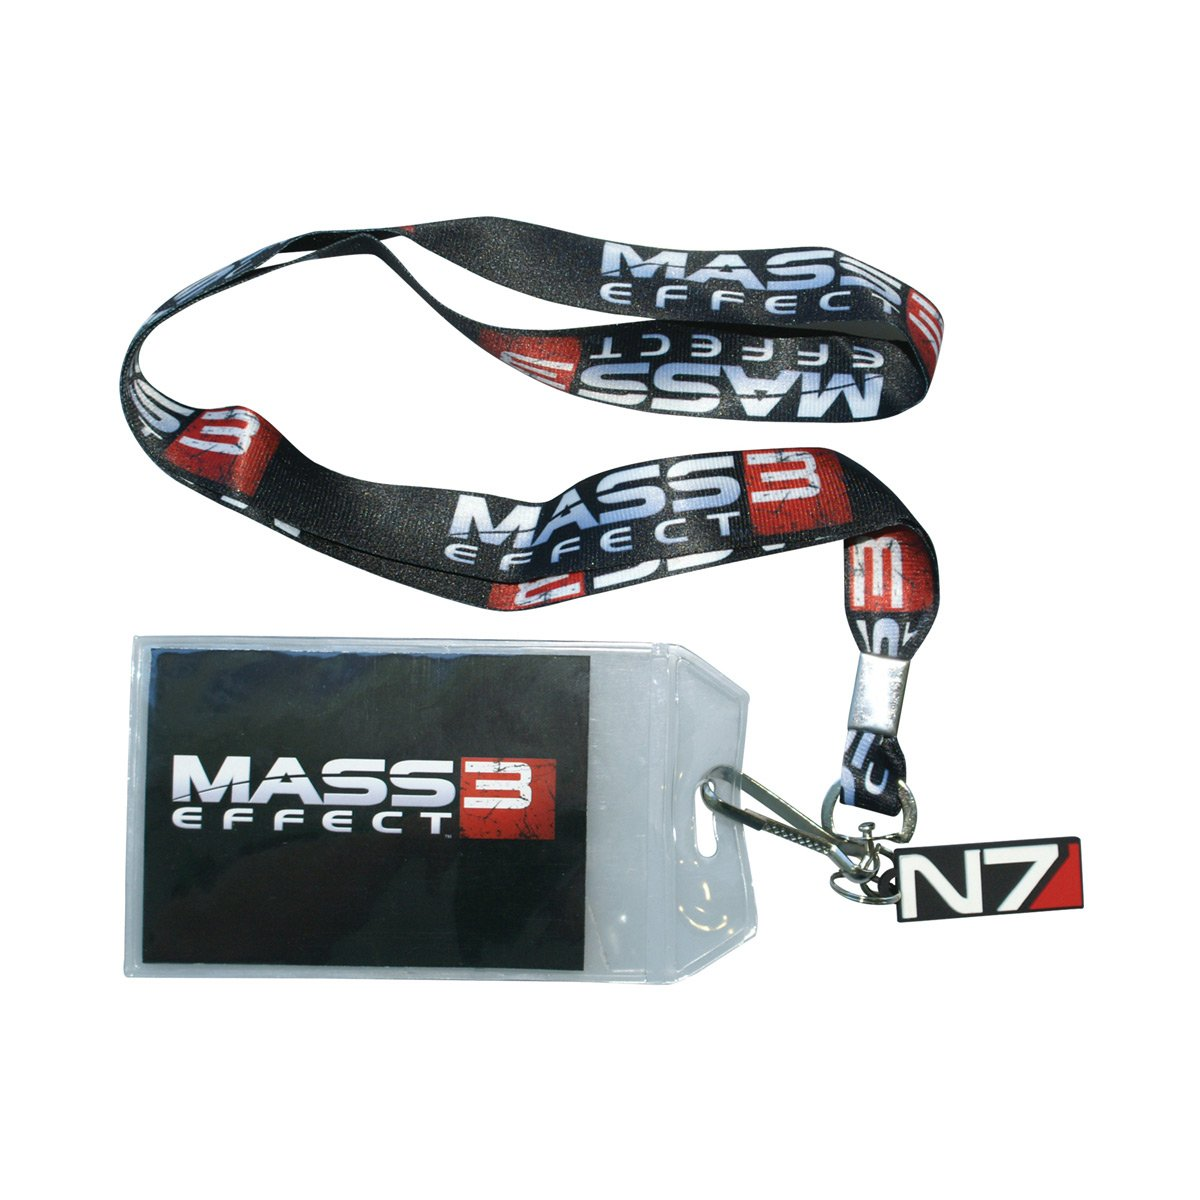 Bioworld Merchandising - Mass Effect 3 Lanyard With Charm Logo